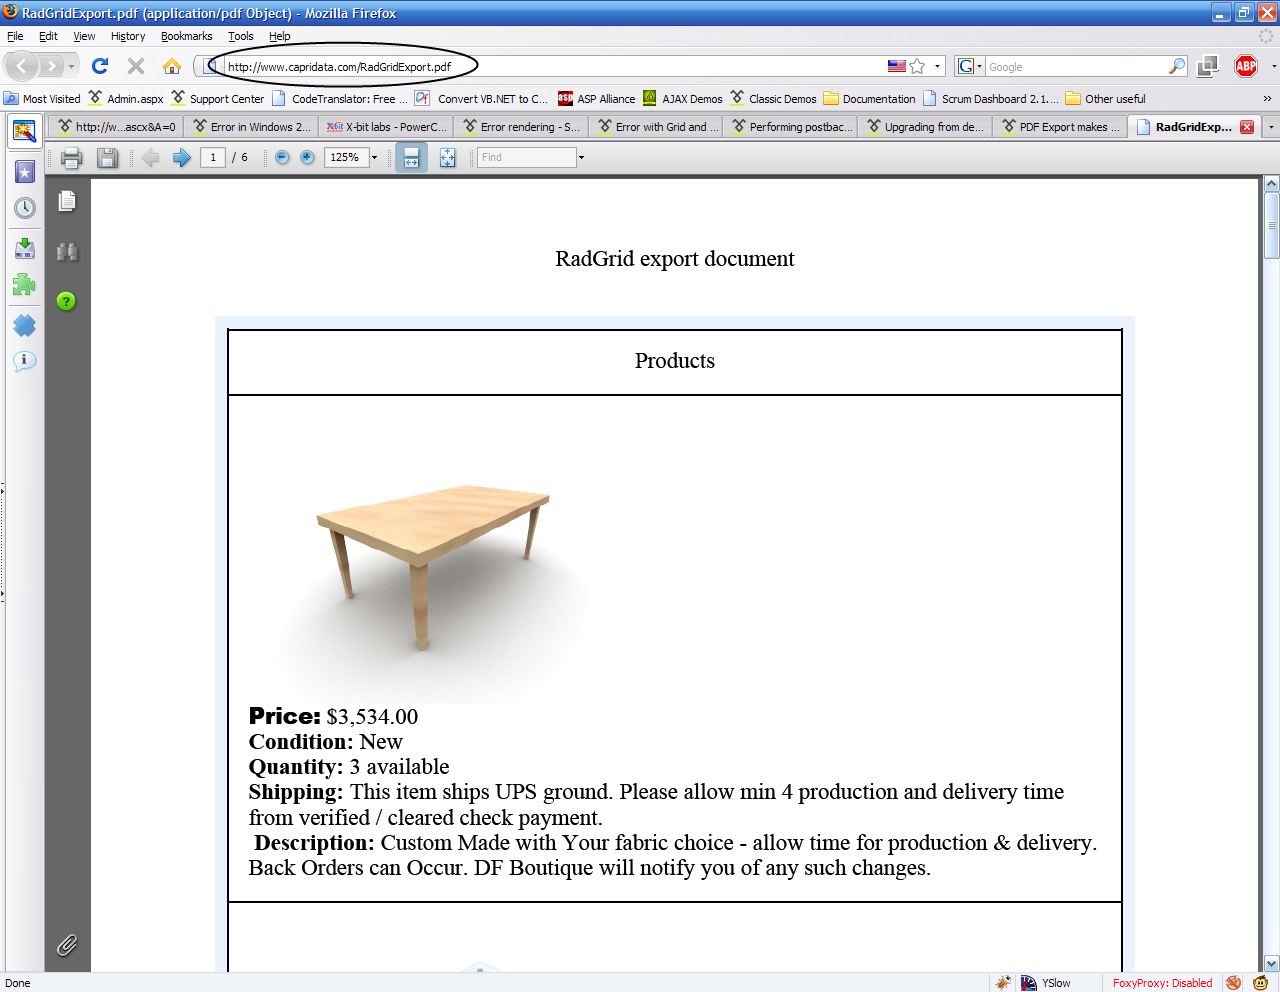 PDF Export makes blank file  in UI for ASP NET AJAX Grid